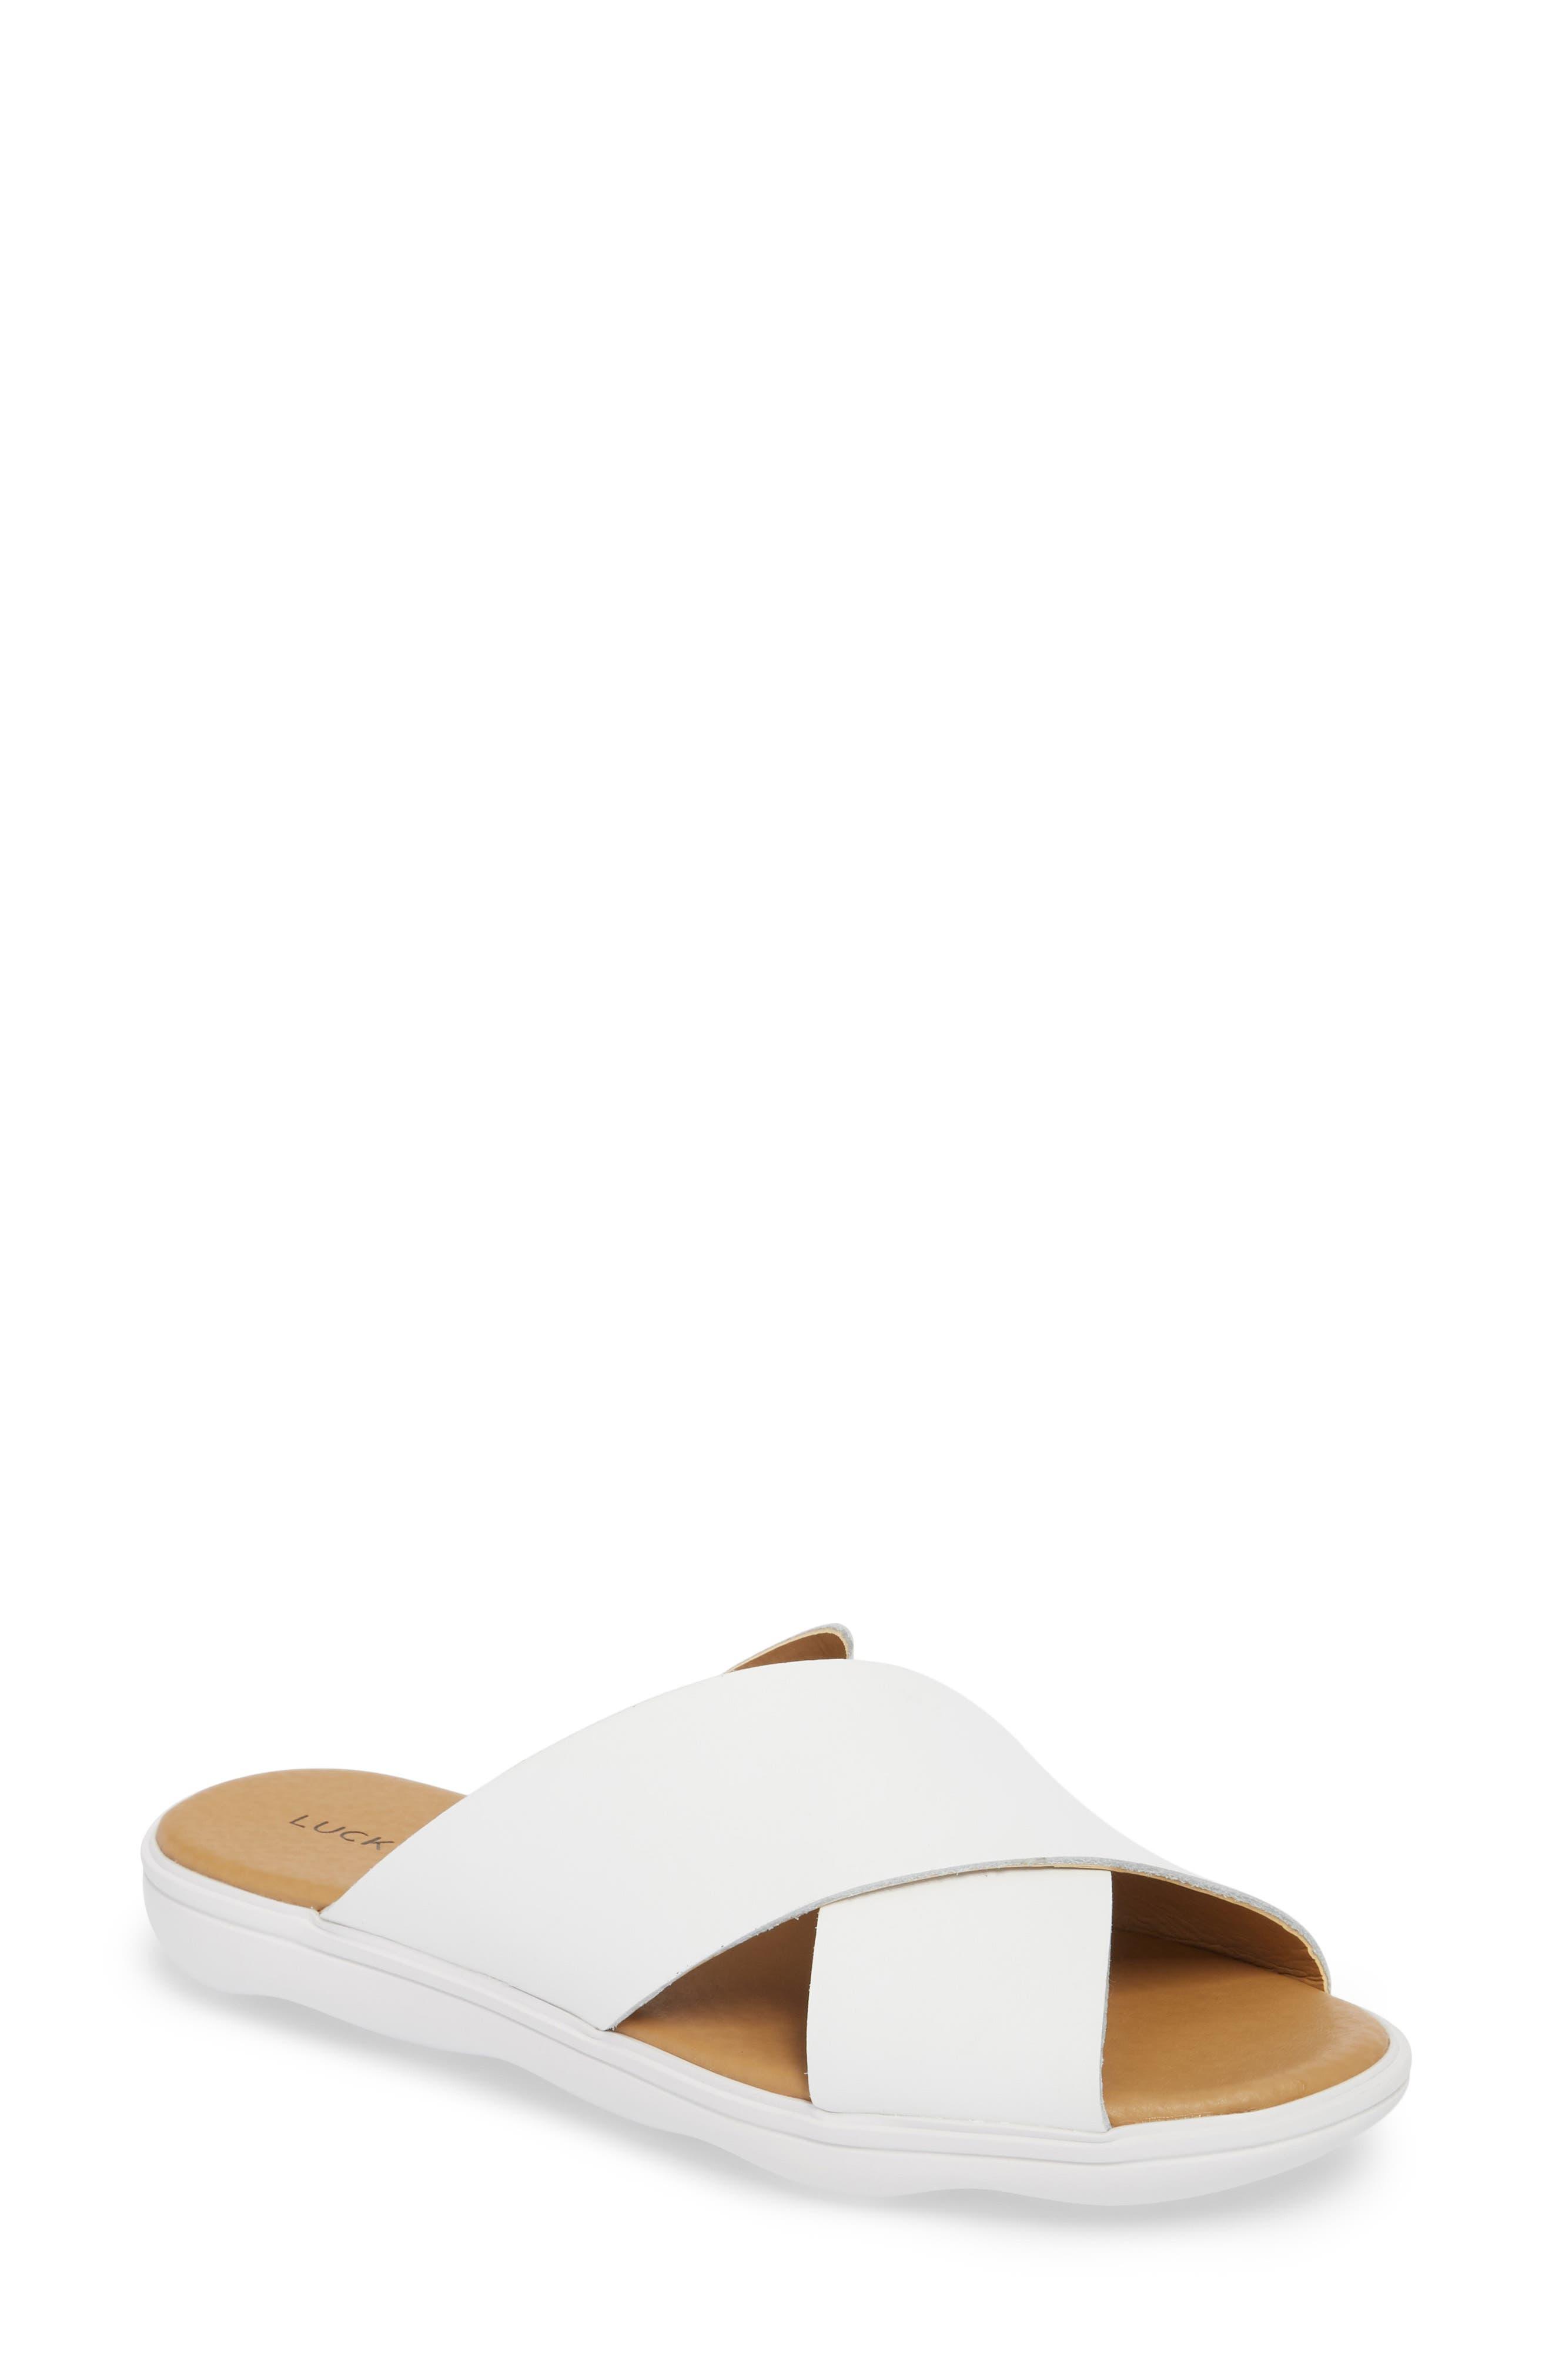 Mahlay Slide Sandal,                             Main thumbnail 1, color,                             Optic White Leather